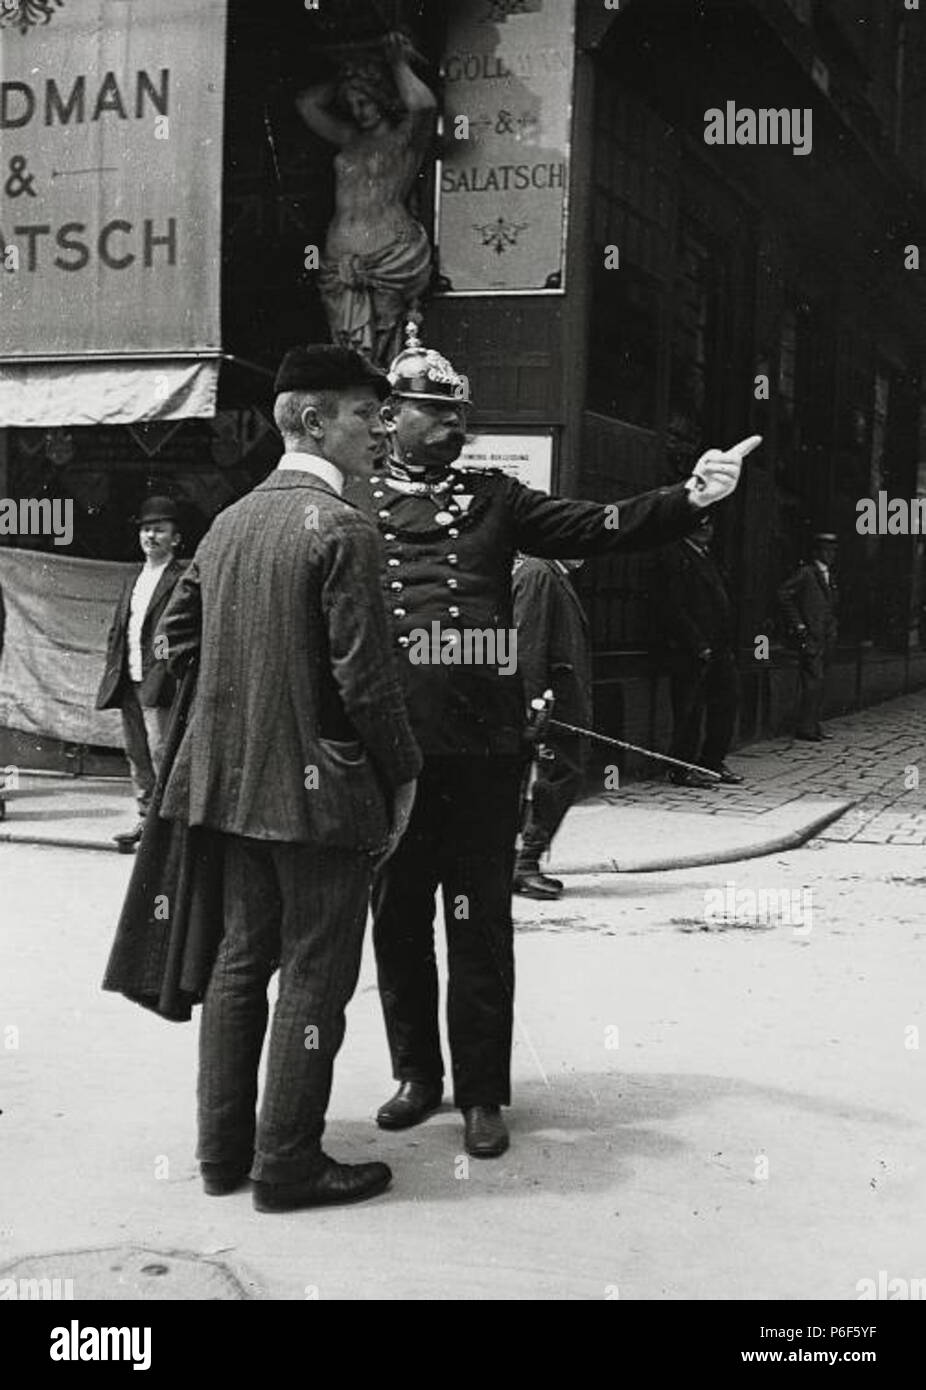 Wachmann vor dem Modewarengeschäft Goldmann & Salatsch, Graben 20, Wien (dort bis 1911 ansässig) . between 1905 and 1911 41 Emil Mayer 067 - Stock Image